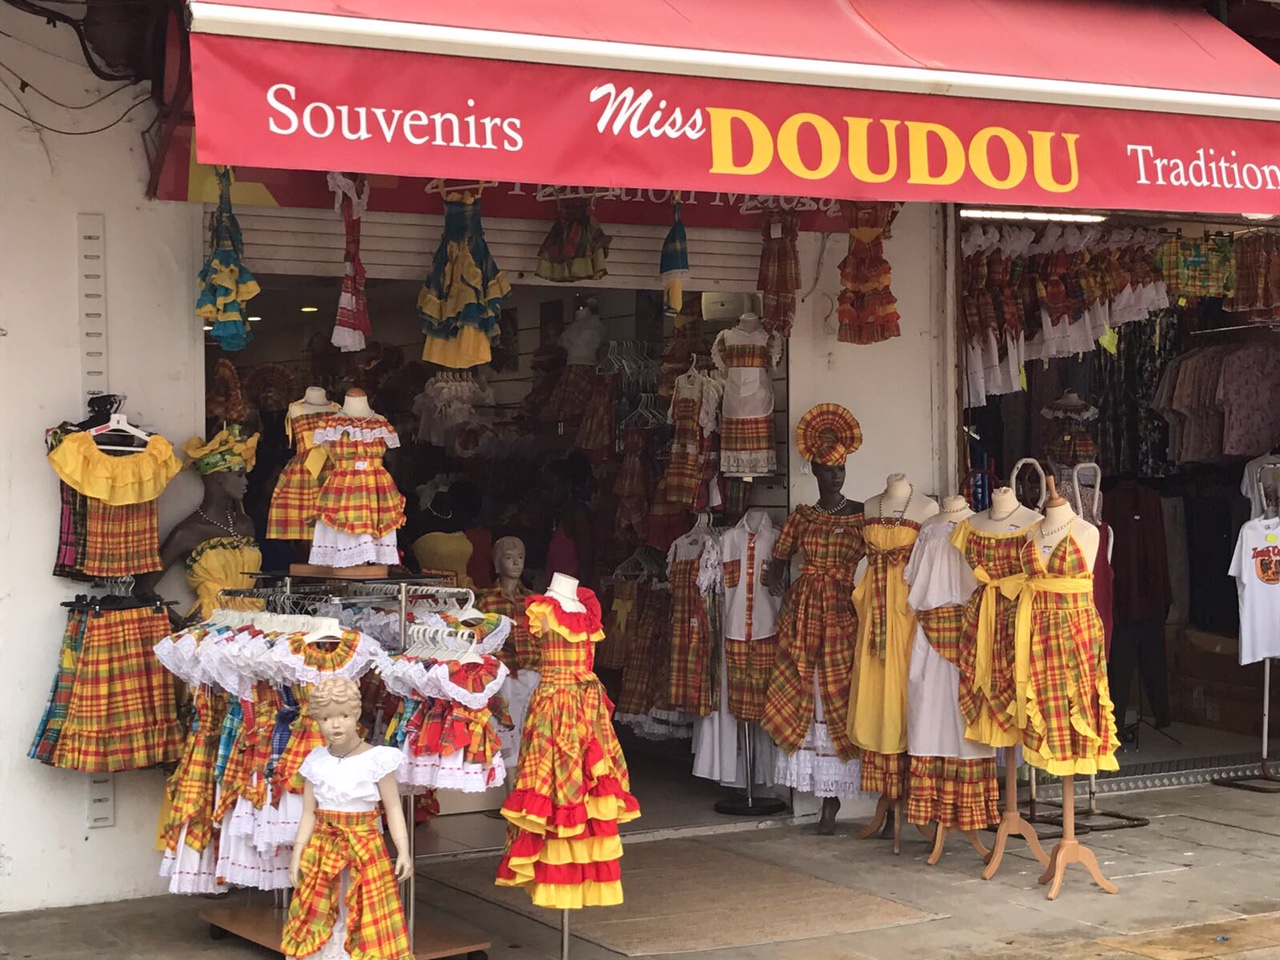 Souvenirladen in Guadeloupe